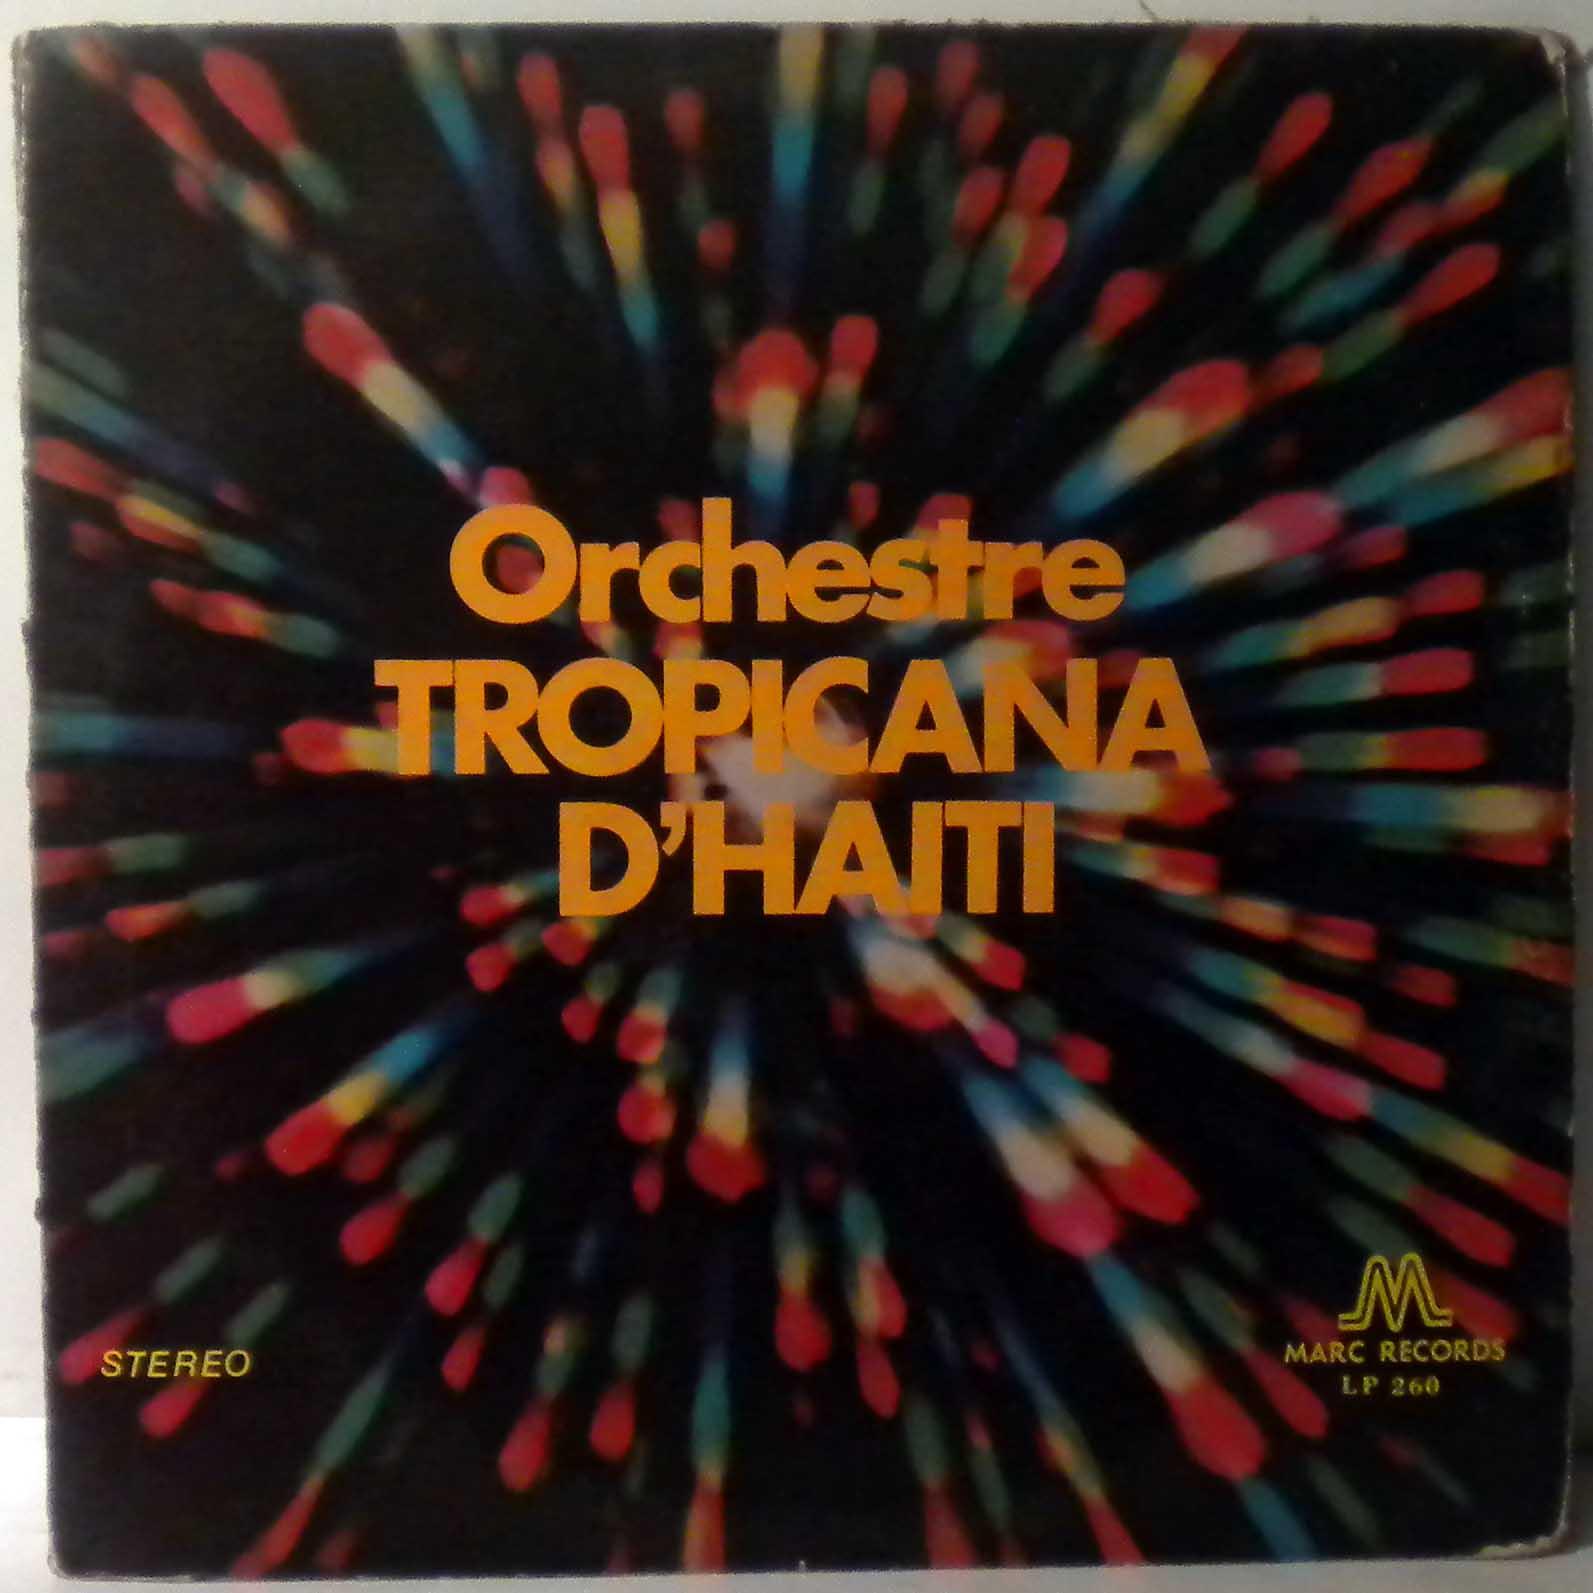 ORCHESTRE TROPICANA D'HAITI - Yolande - LP